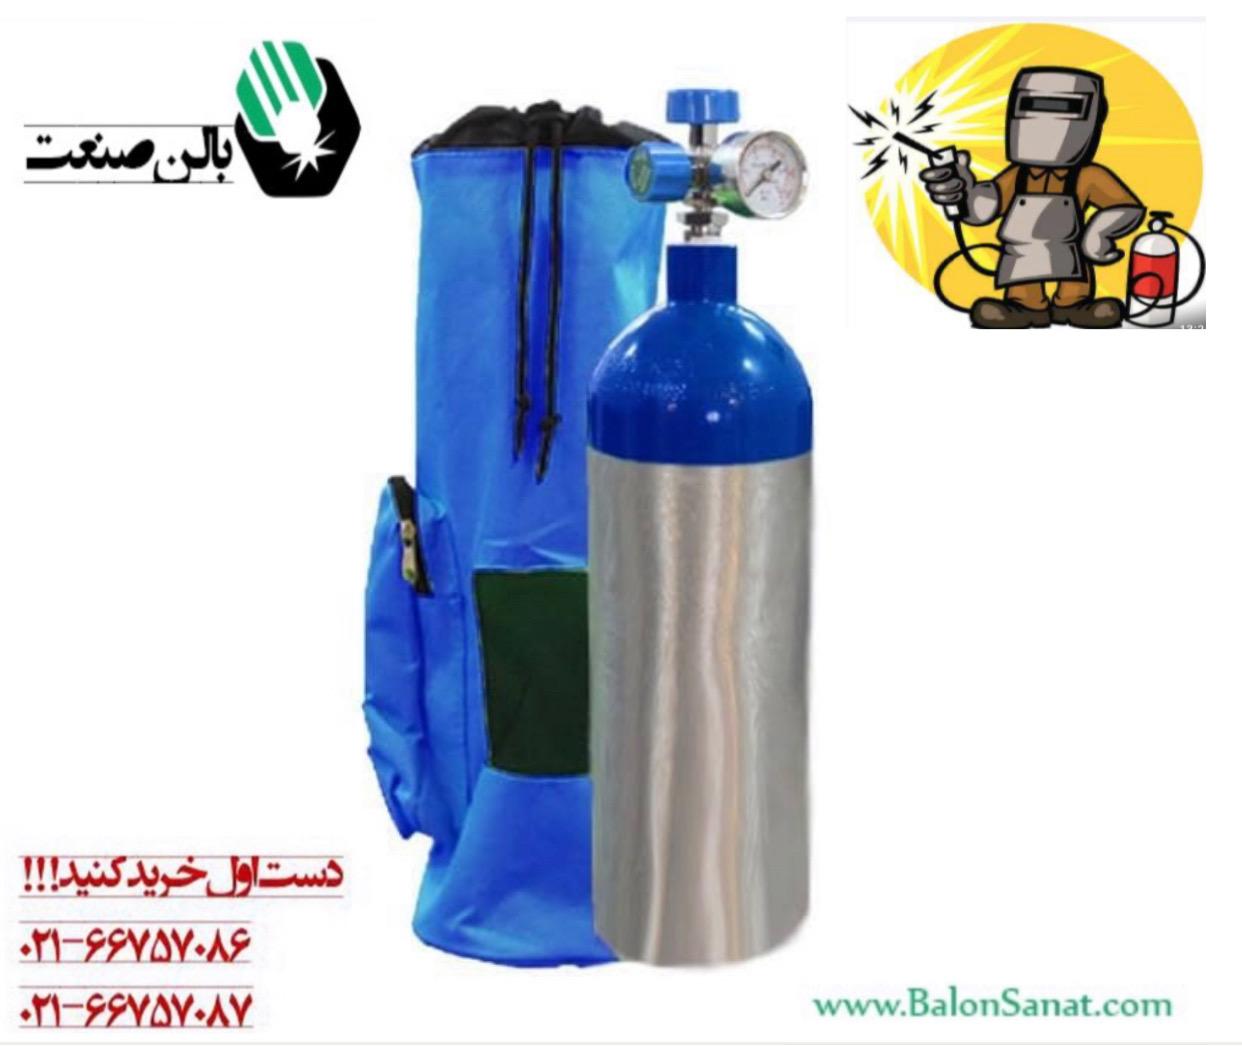 کپسول کوله پشتی آلمینیوم ،کپسول اکسیژن بیماران ،، کوله پشتی کپسول اکسیژن ، کپسول قابل حمل